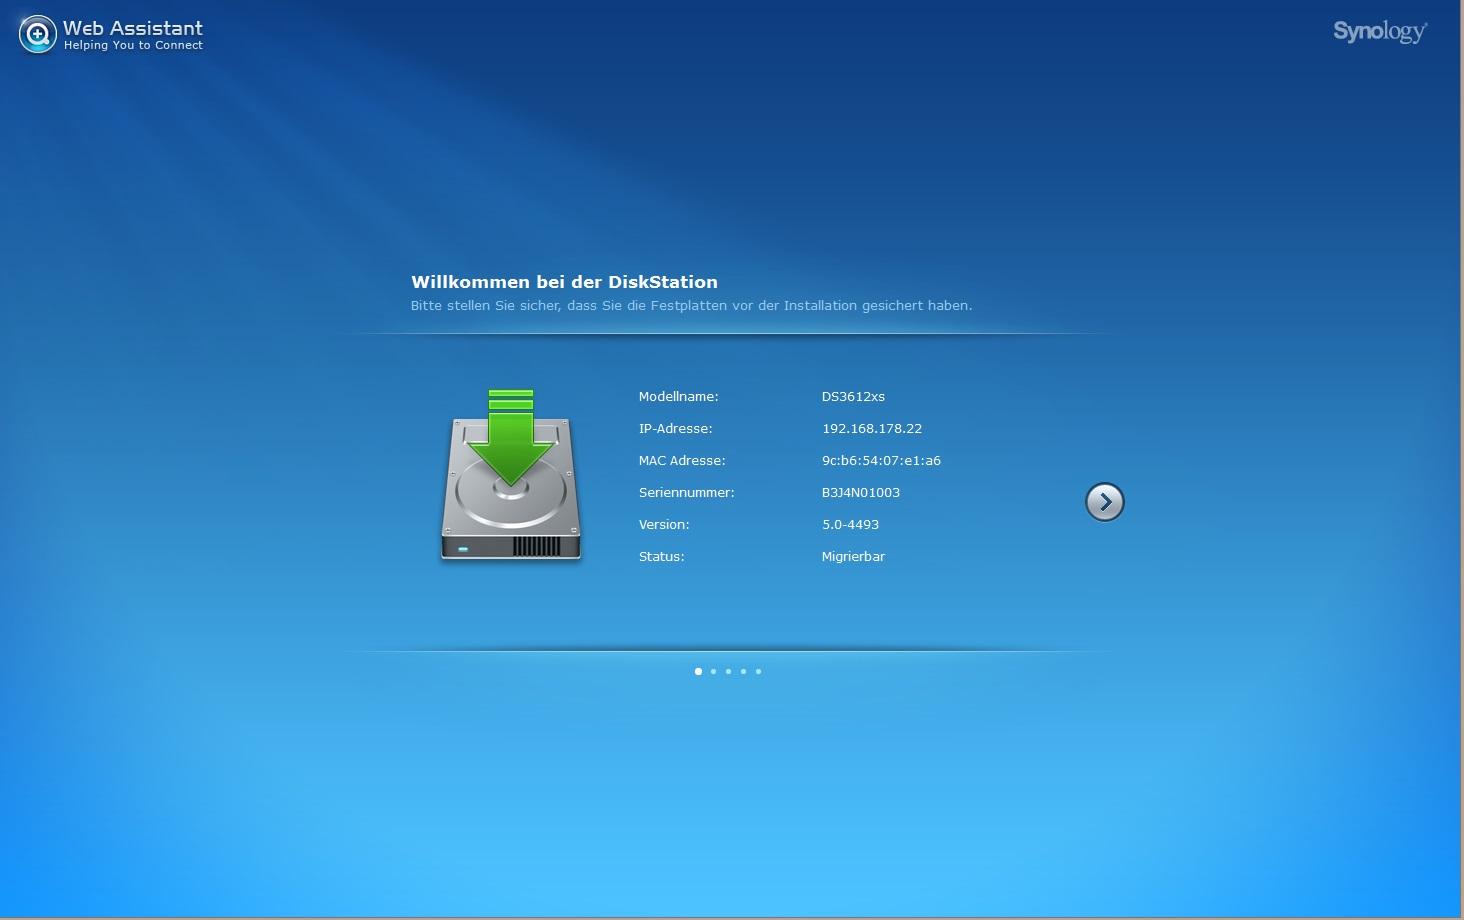 593ef3b46816a_WebAssistant.jpg.1fa27e6c78e3418168706e473e48cc3c.jpg